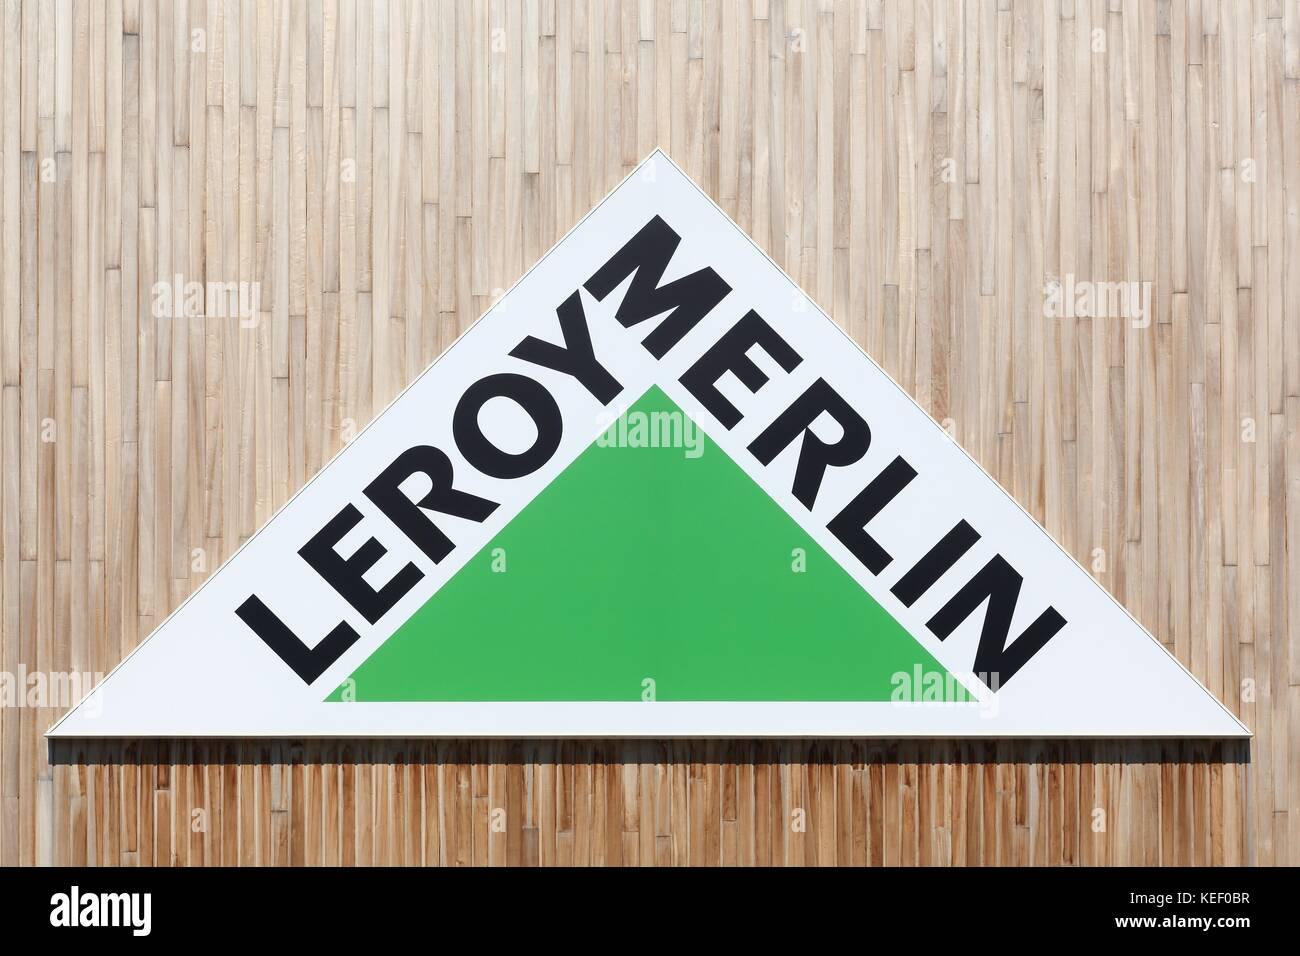 Pared leroy merlin excellent interesting hermosa perchero - Plaqueta decorativa ikea ...